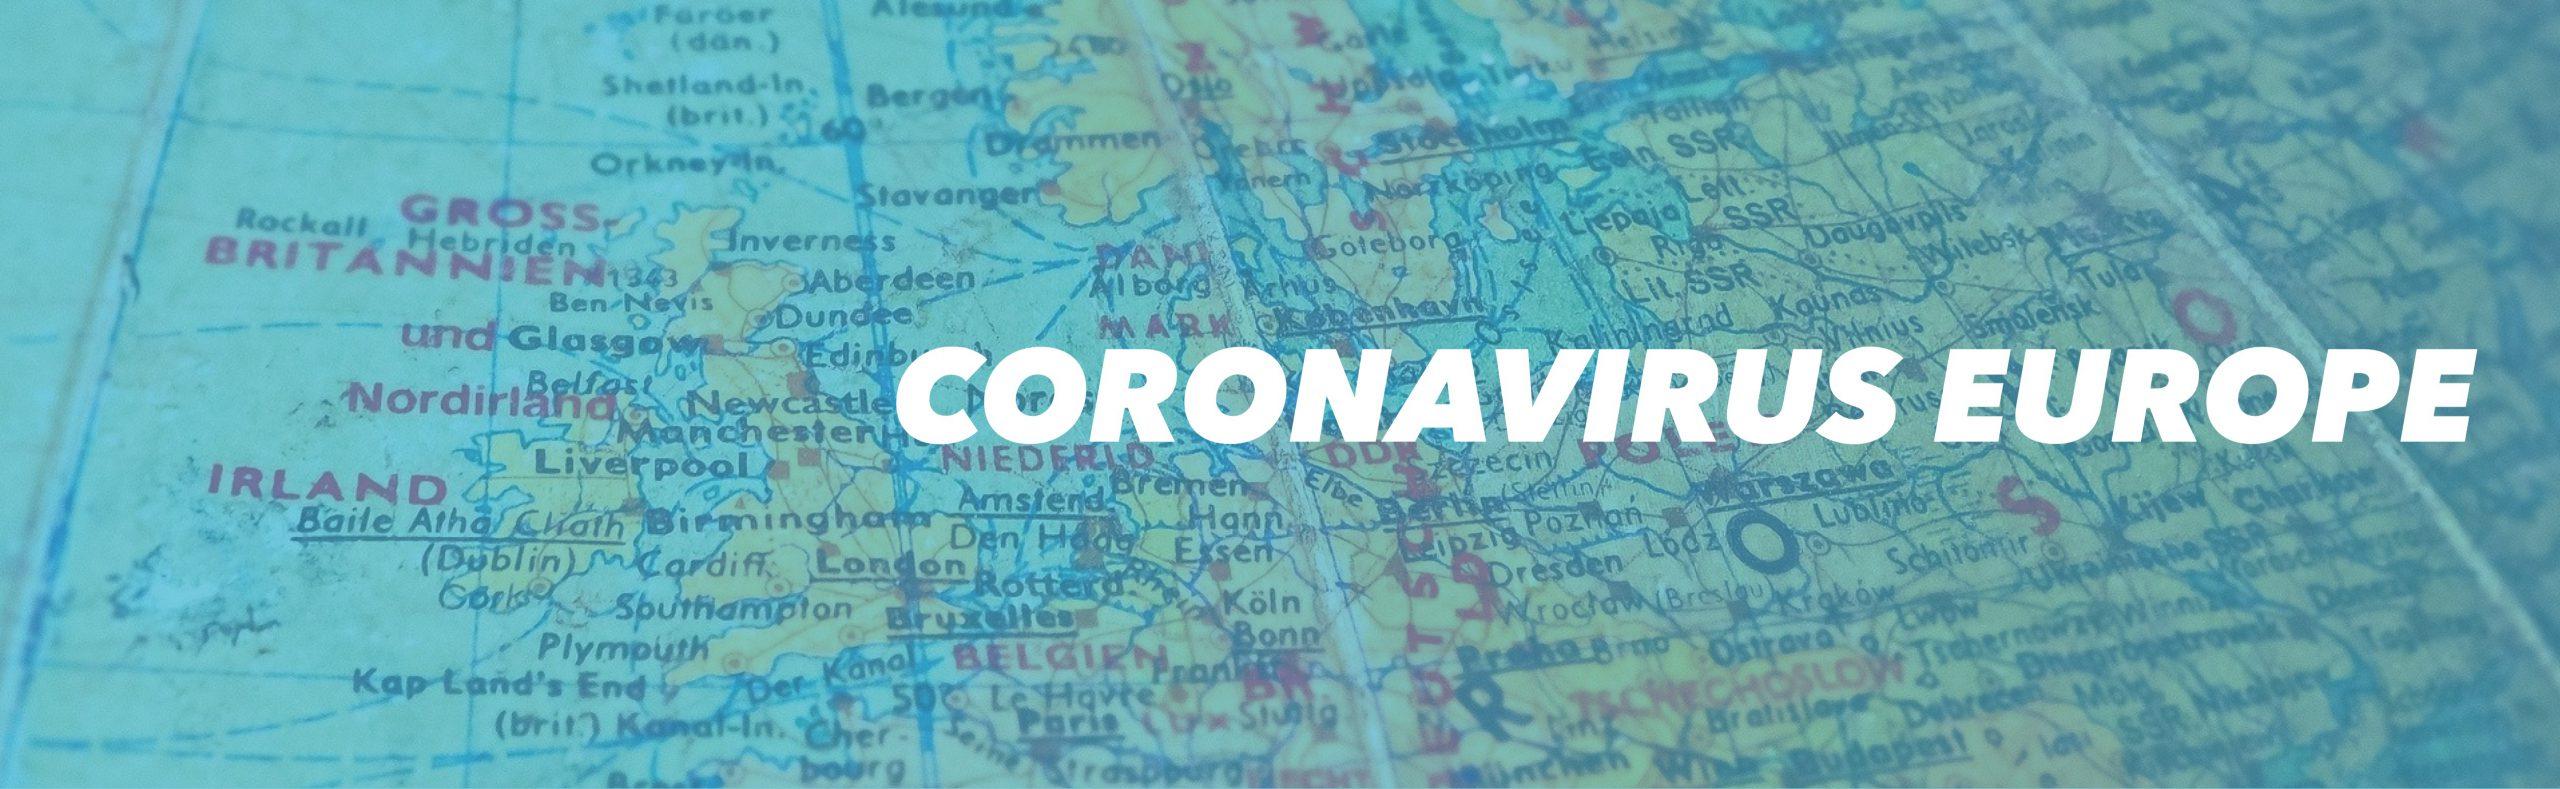 coronavirus statistiques europe